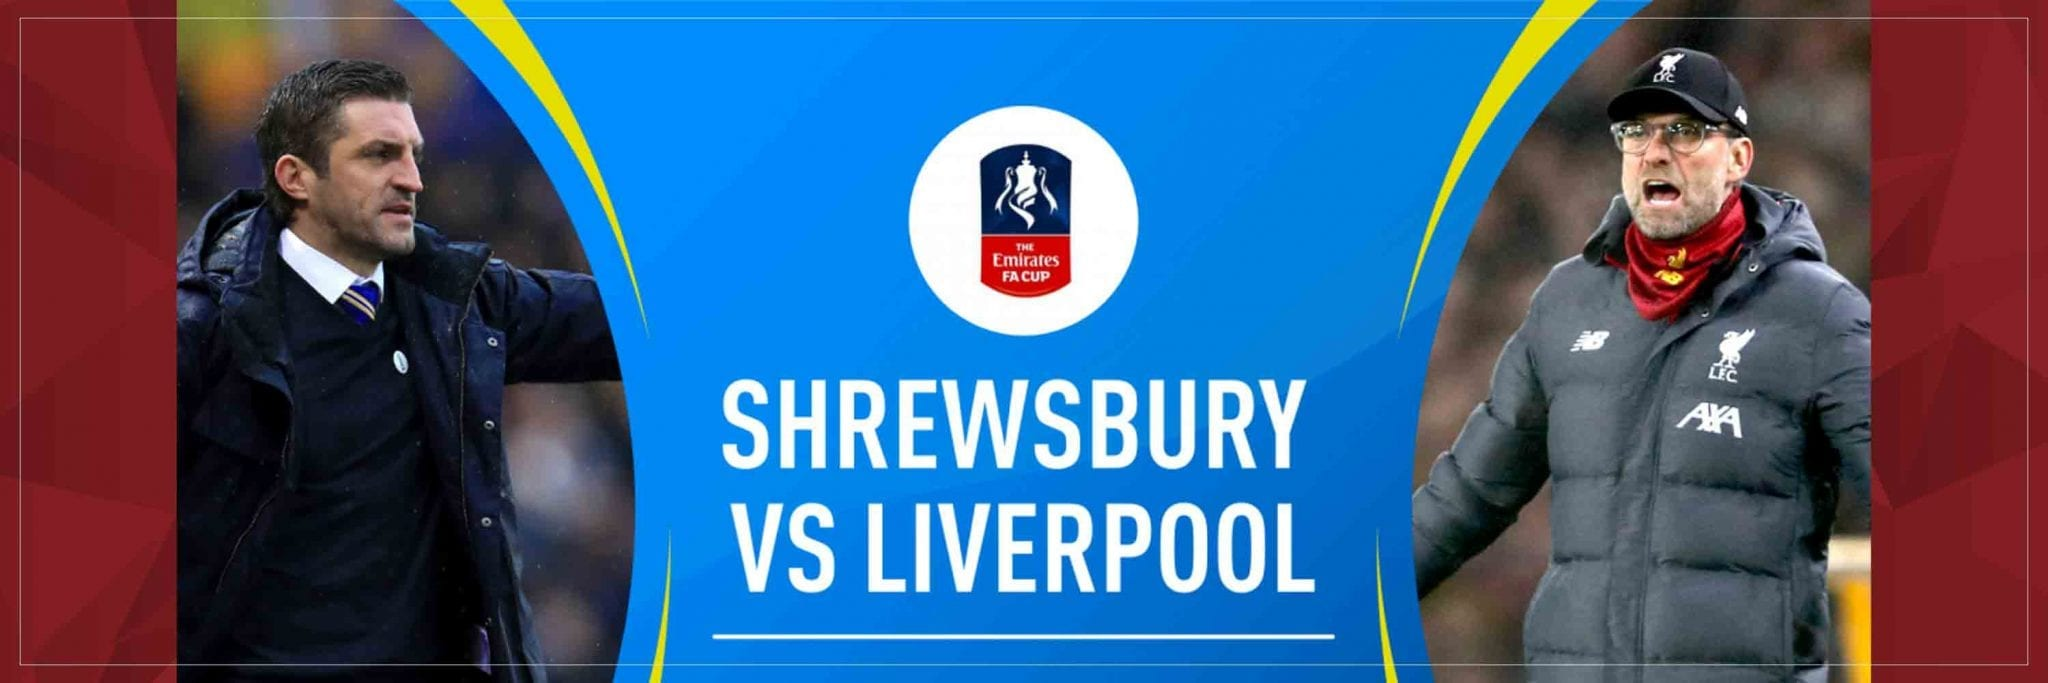 Liverpool-vs-Shrewsbury